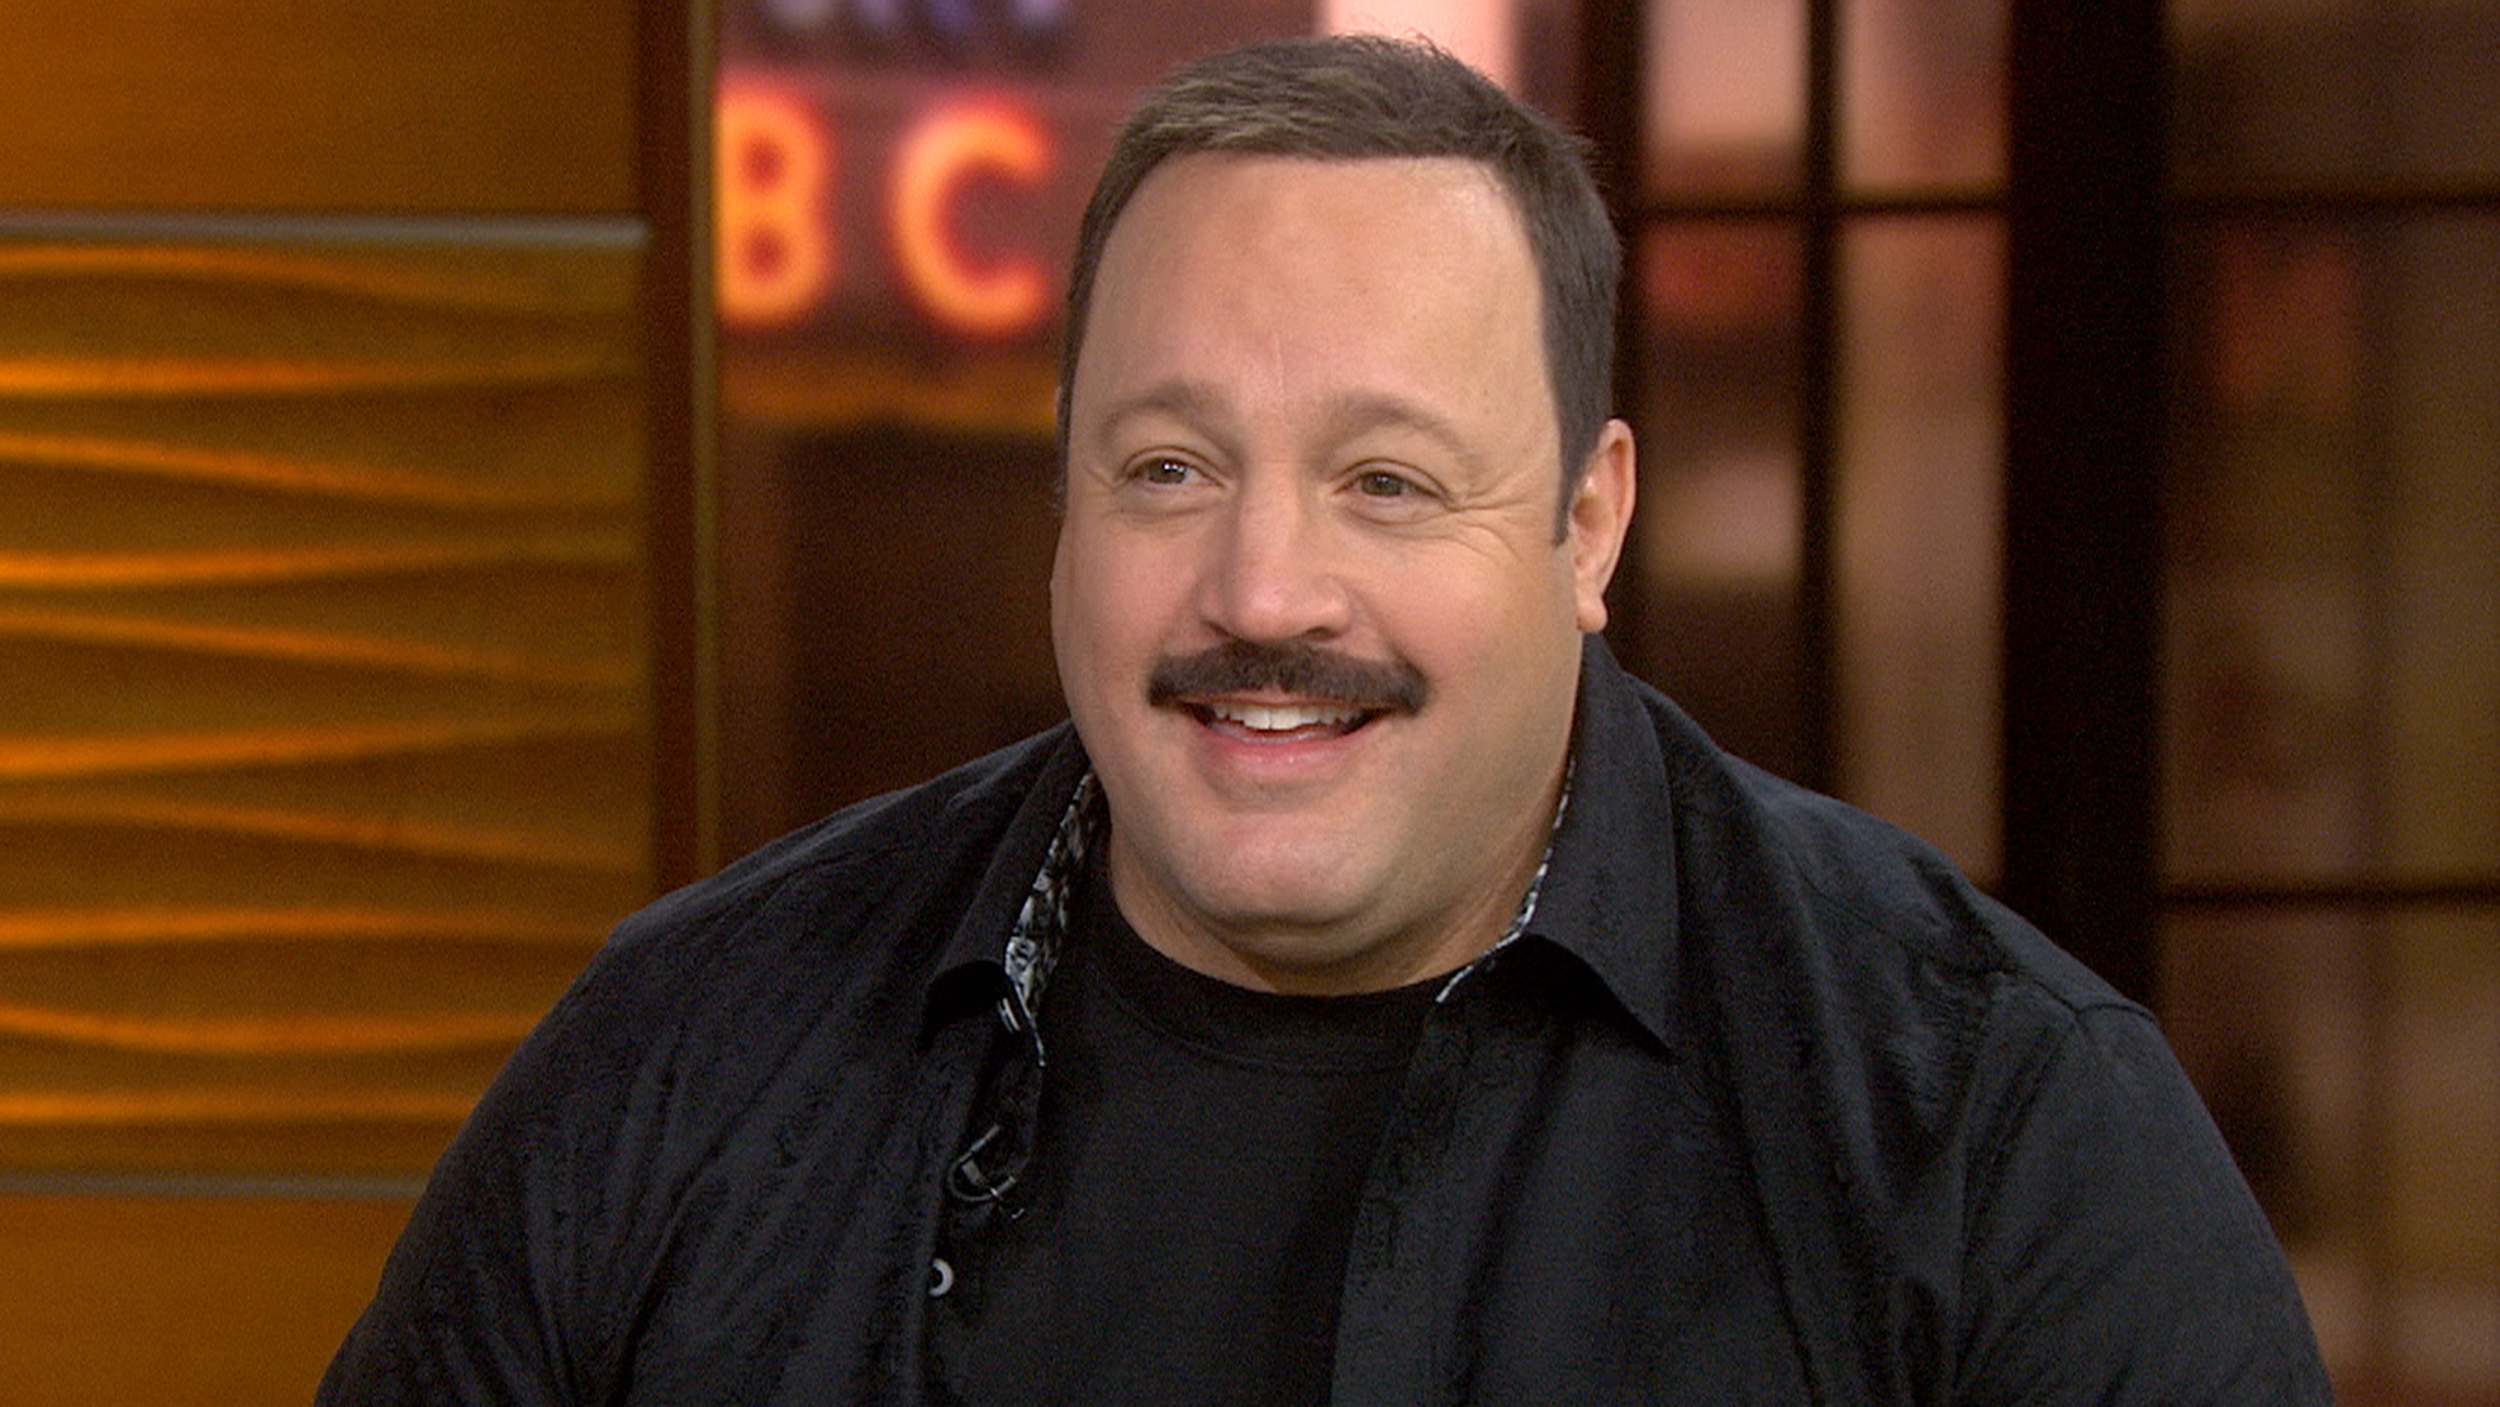 Kevin James and 'organic' mustache return in 'Paul Blart ...